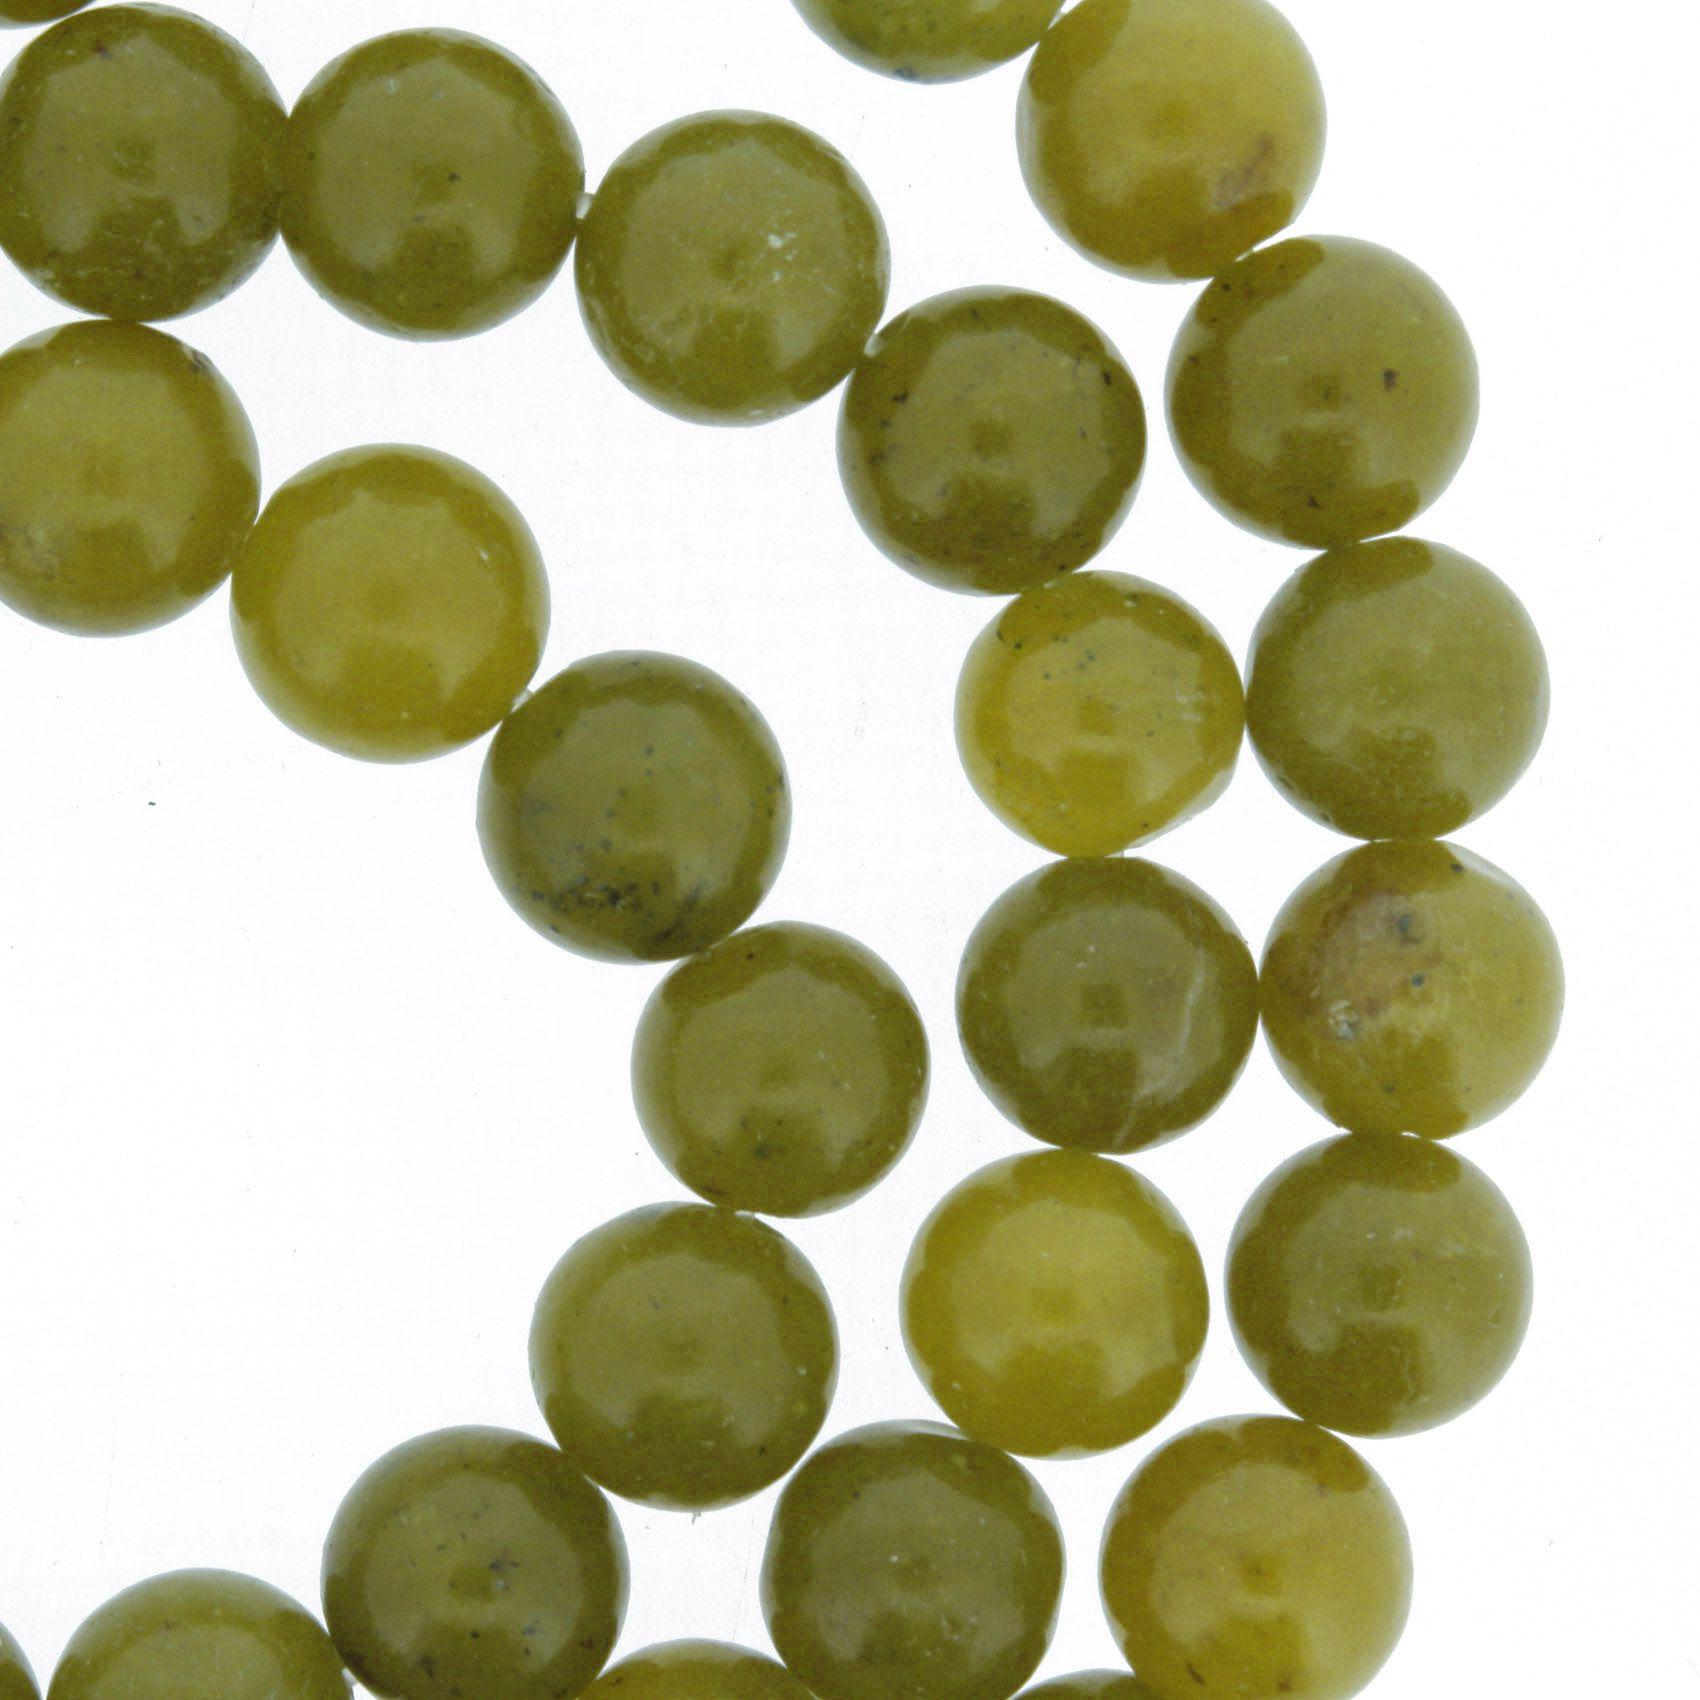 Fio de Pedra - Jade Oliva - 8mm  - Stéphanie Bijoux® - Peças para Bijuterias e Artesanato